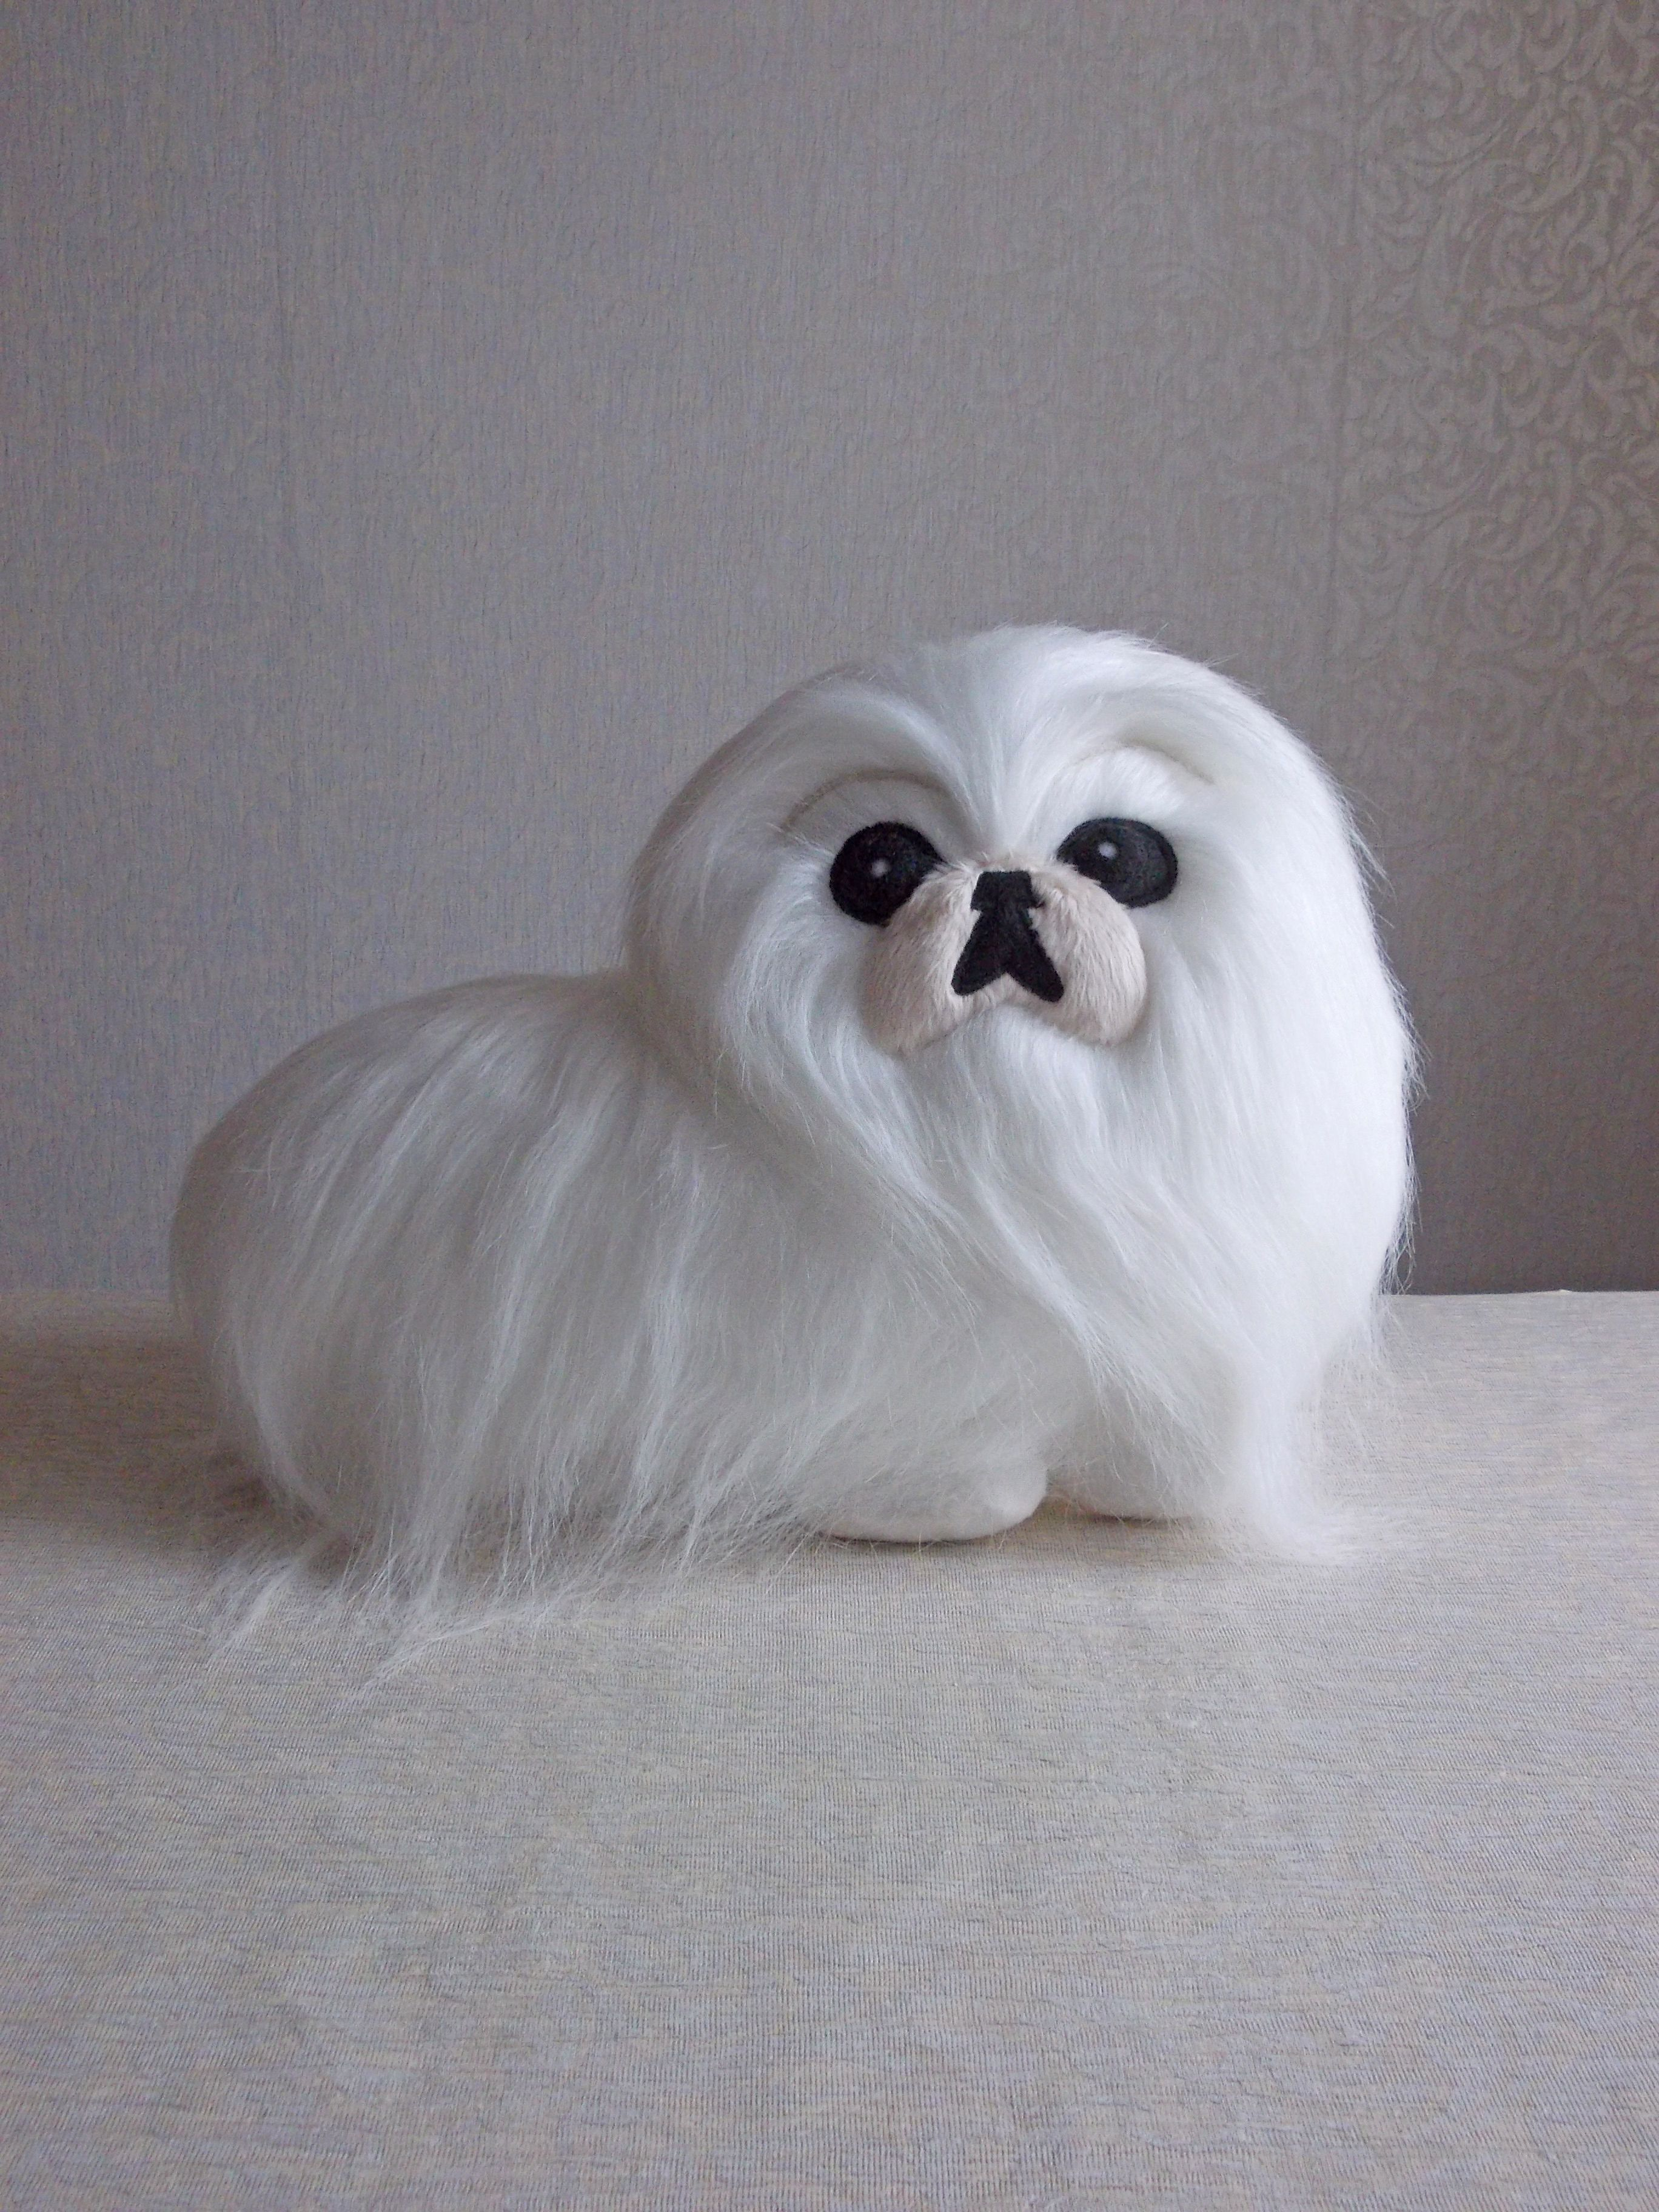 Lion Named White Fur Pekingese Stuffed Animal White Pekingese